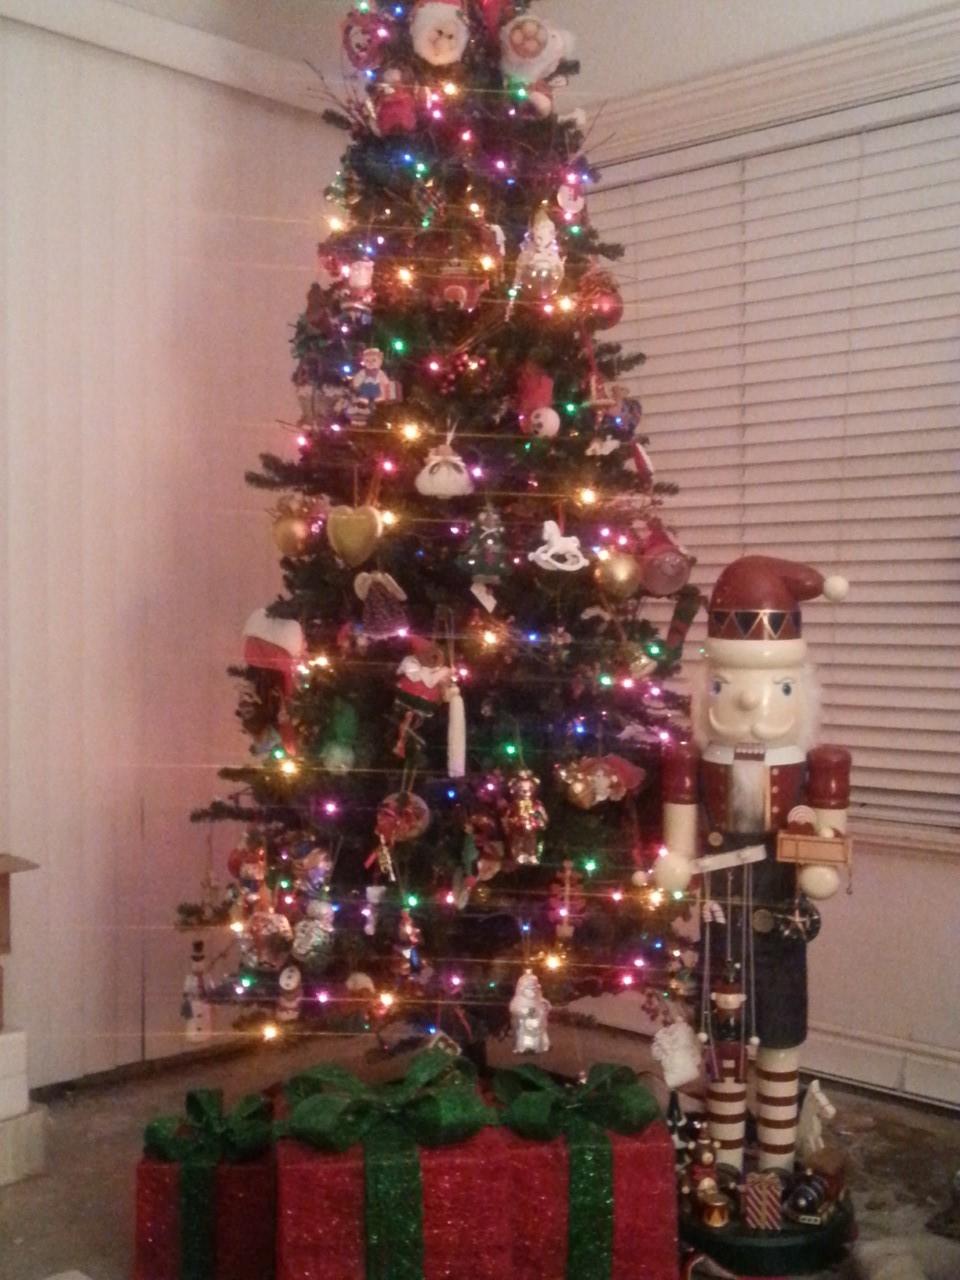 ChristmasTree_2016_2.jpg